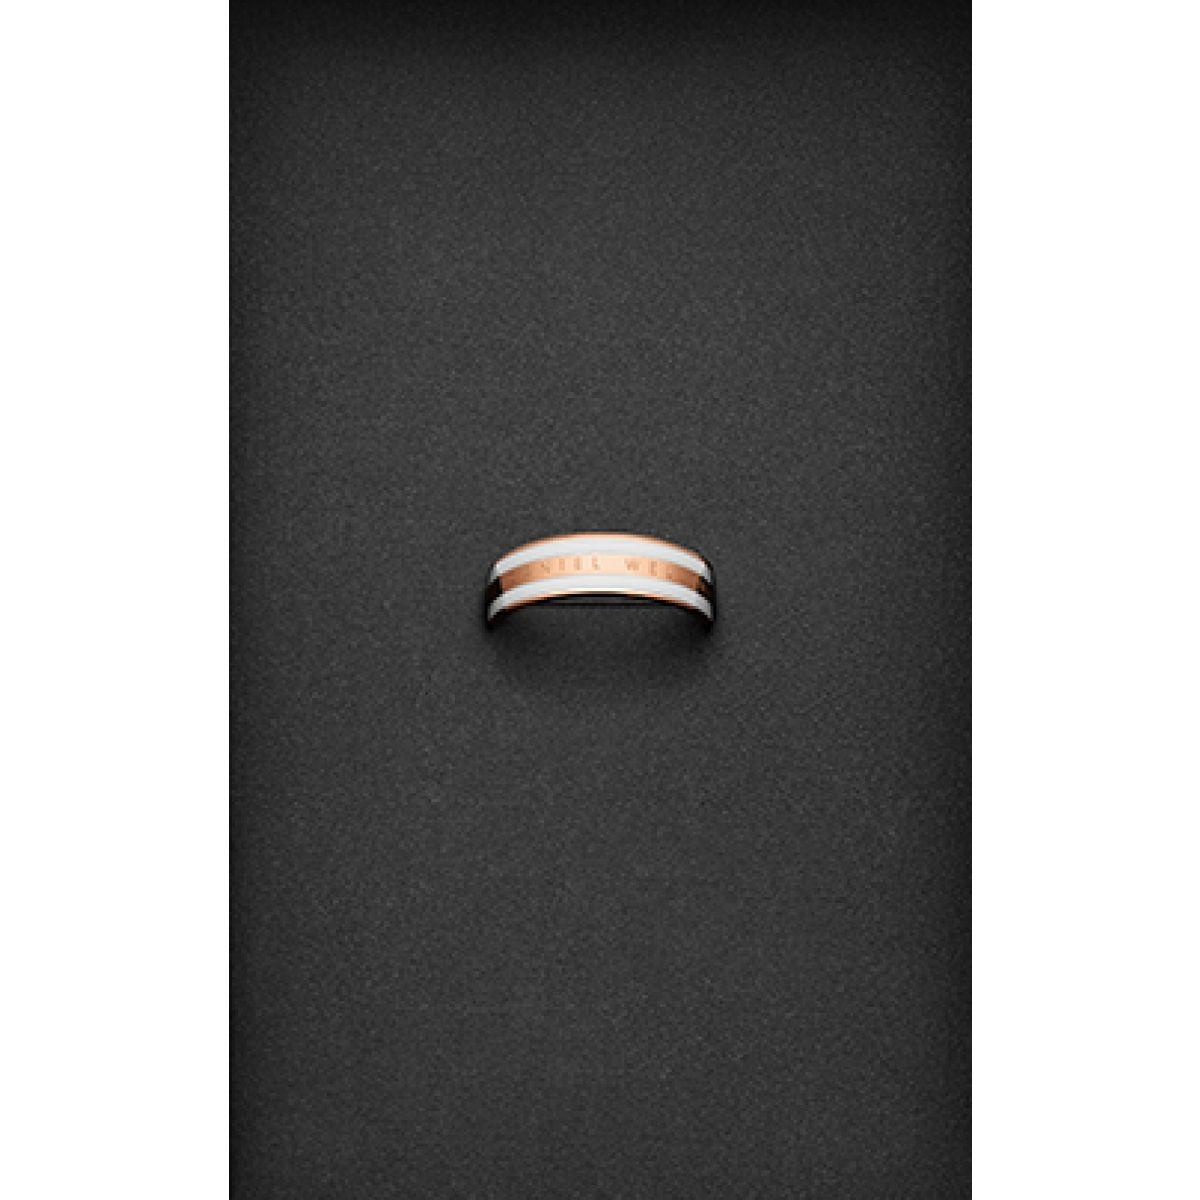 dw官网 dw手表官网 dw中国官网 dw官方旗舰店 DW DW官网  Classic Ring Satin White RG 52mm